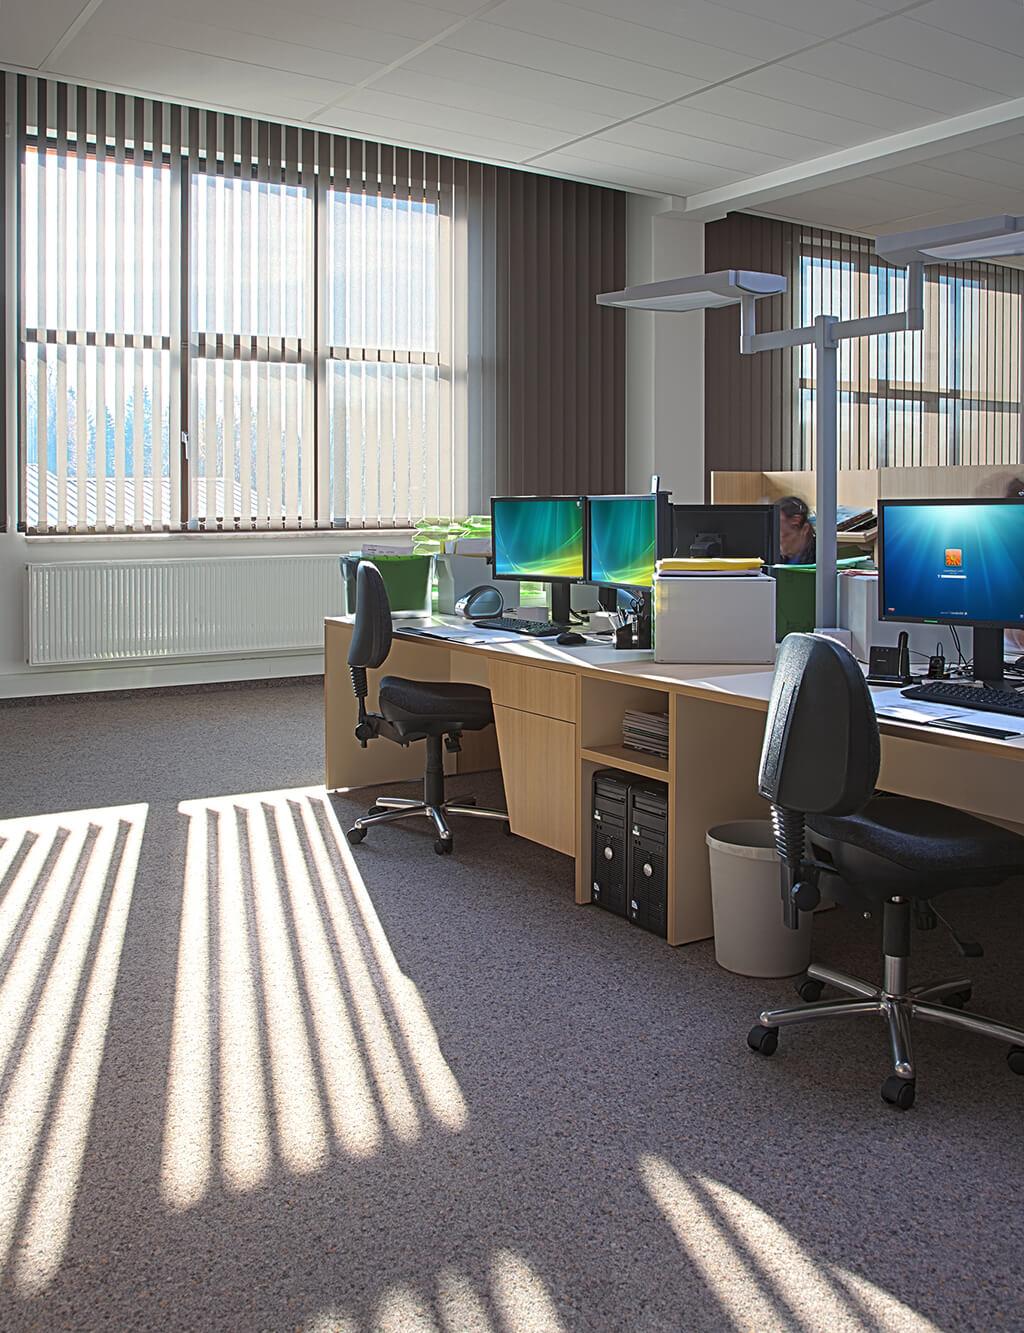 Cremefarbener Lamellenvorhang im Großraumbüro